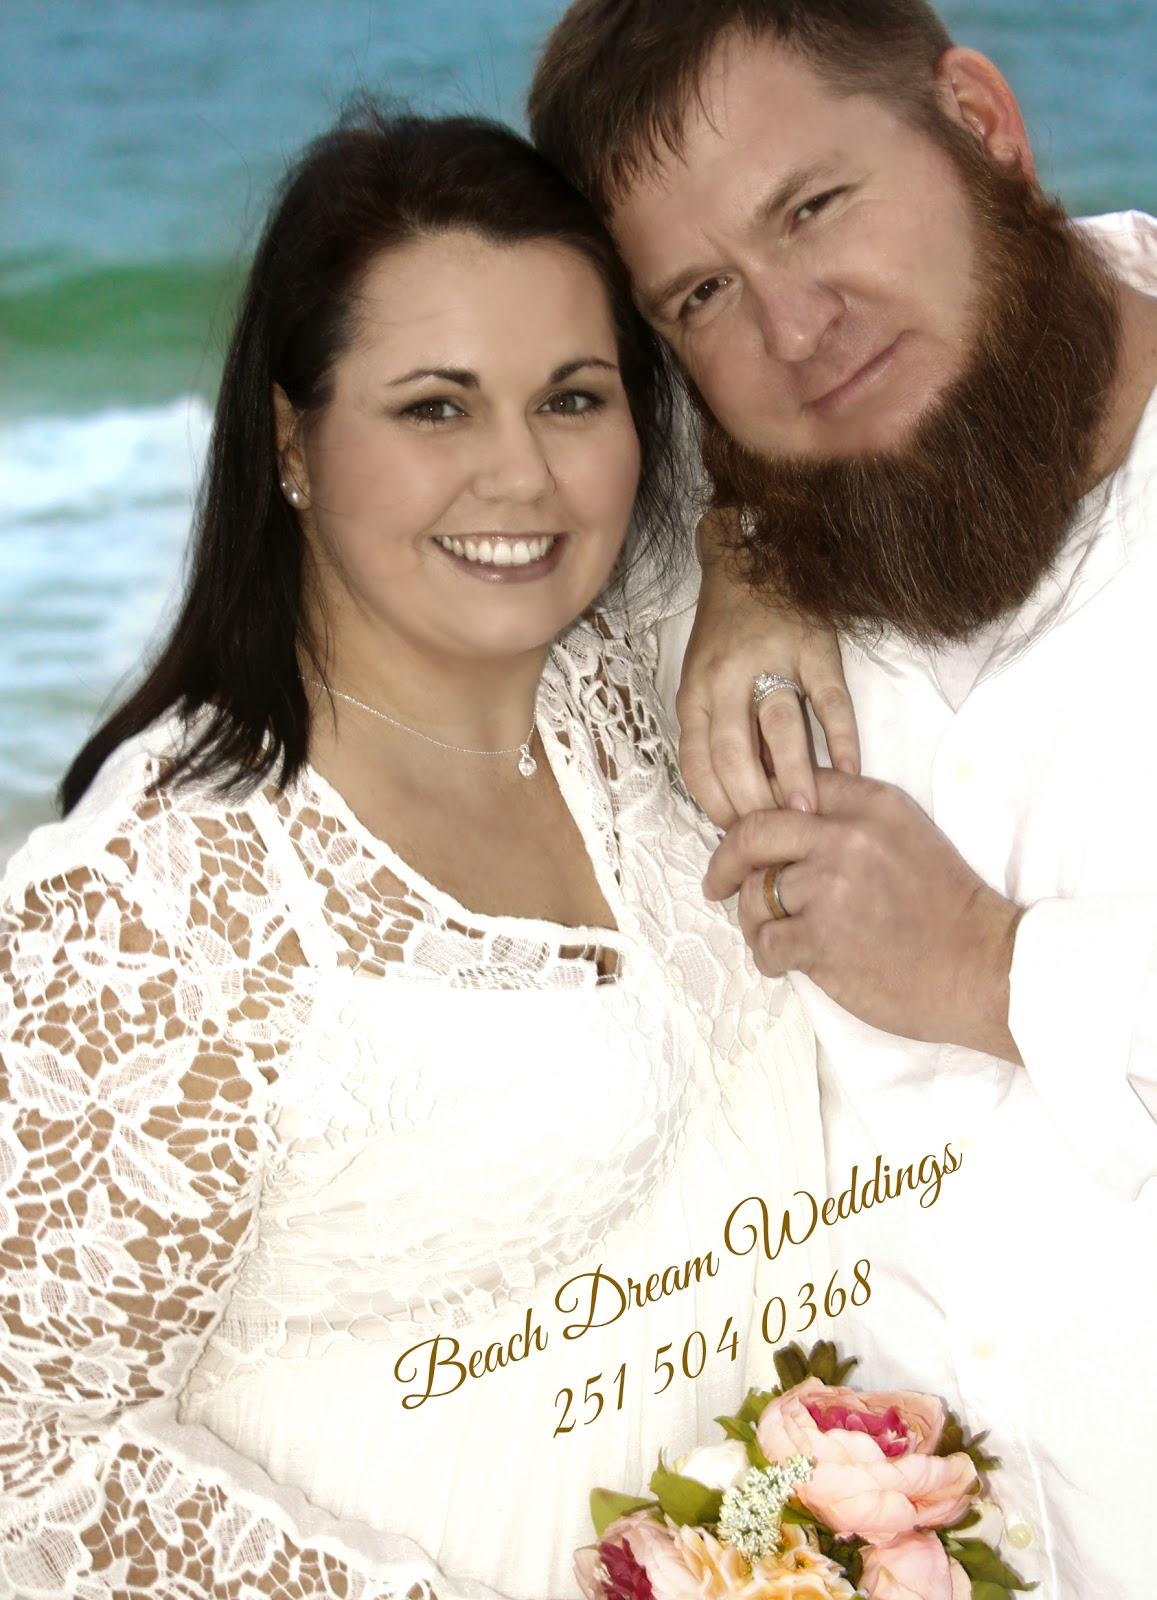 Beach Dream Weddings Llc 251 504 0368